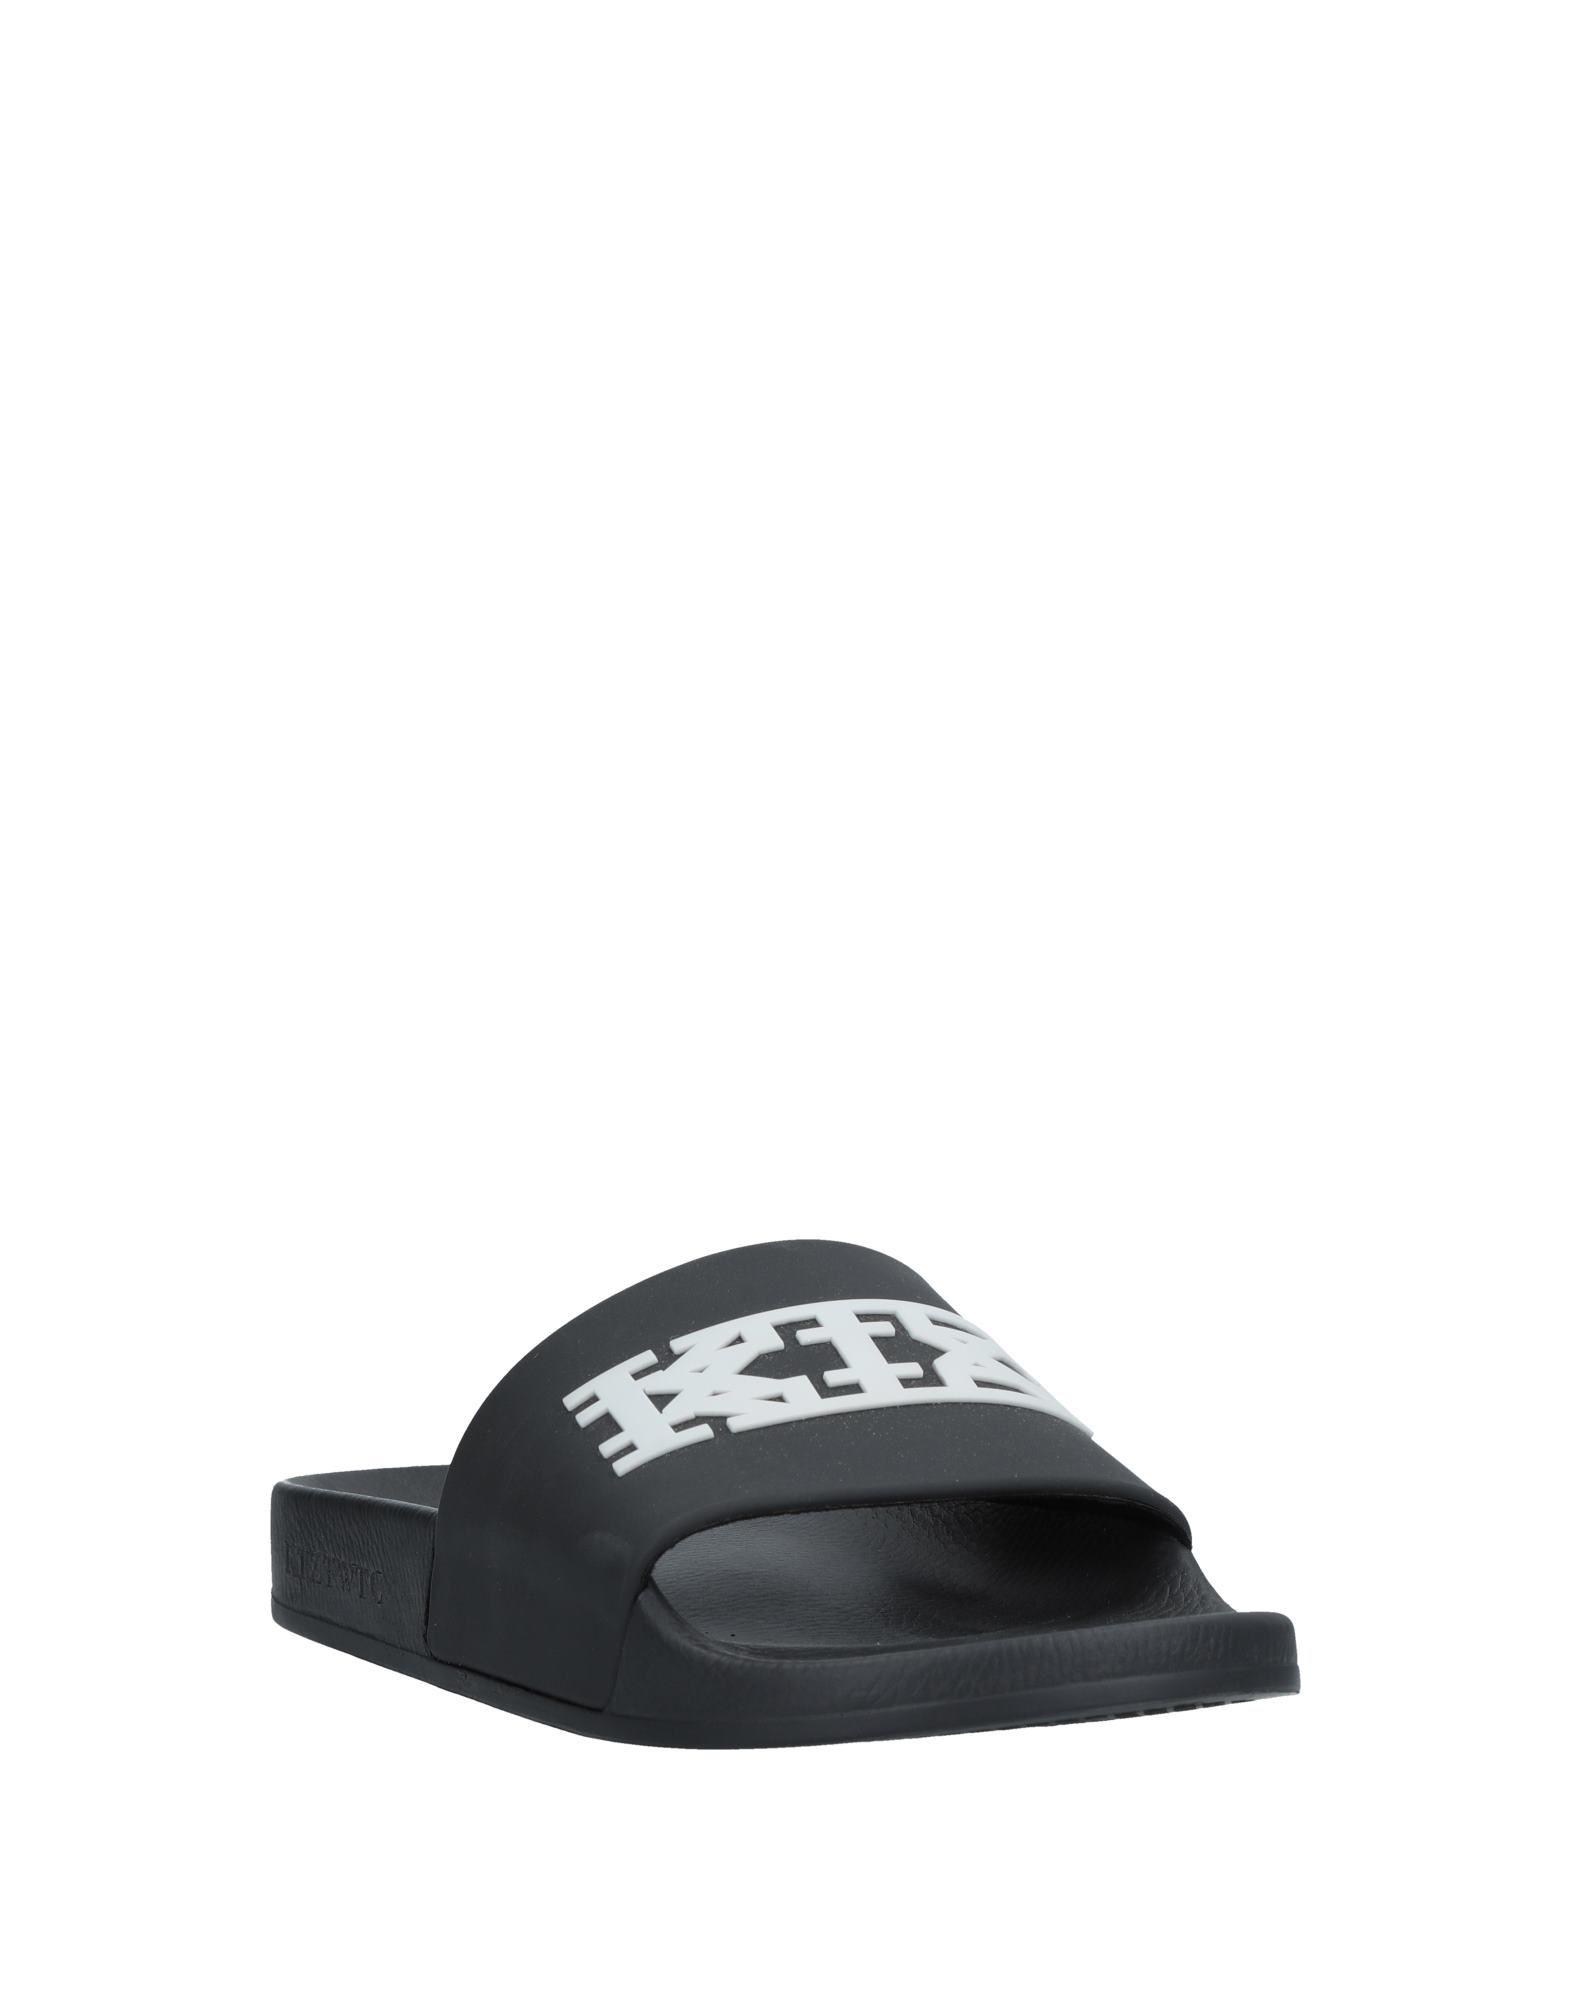 Rabatt echte Schuhe Ktz Sandalen Herren  11538201GX